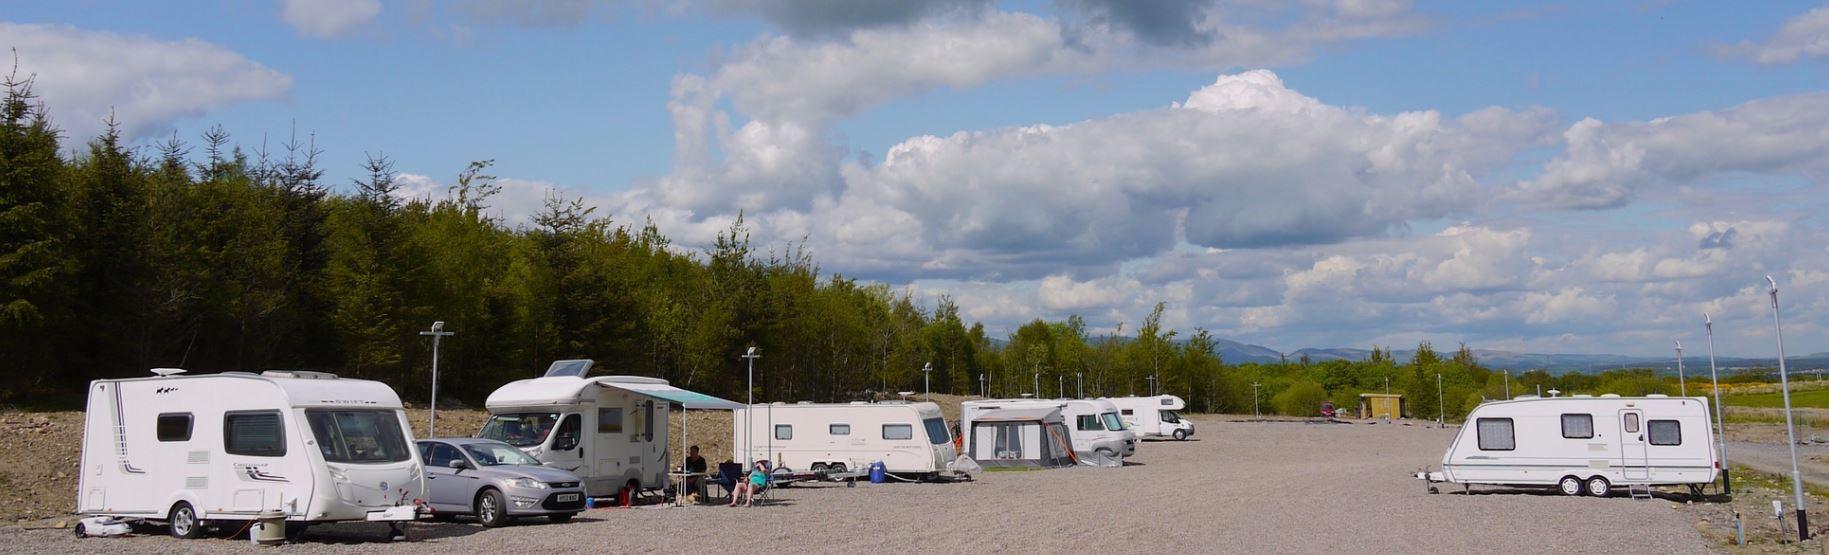 The Wheel Caravan Park and Campsite